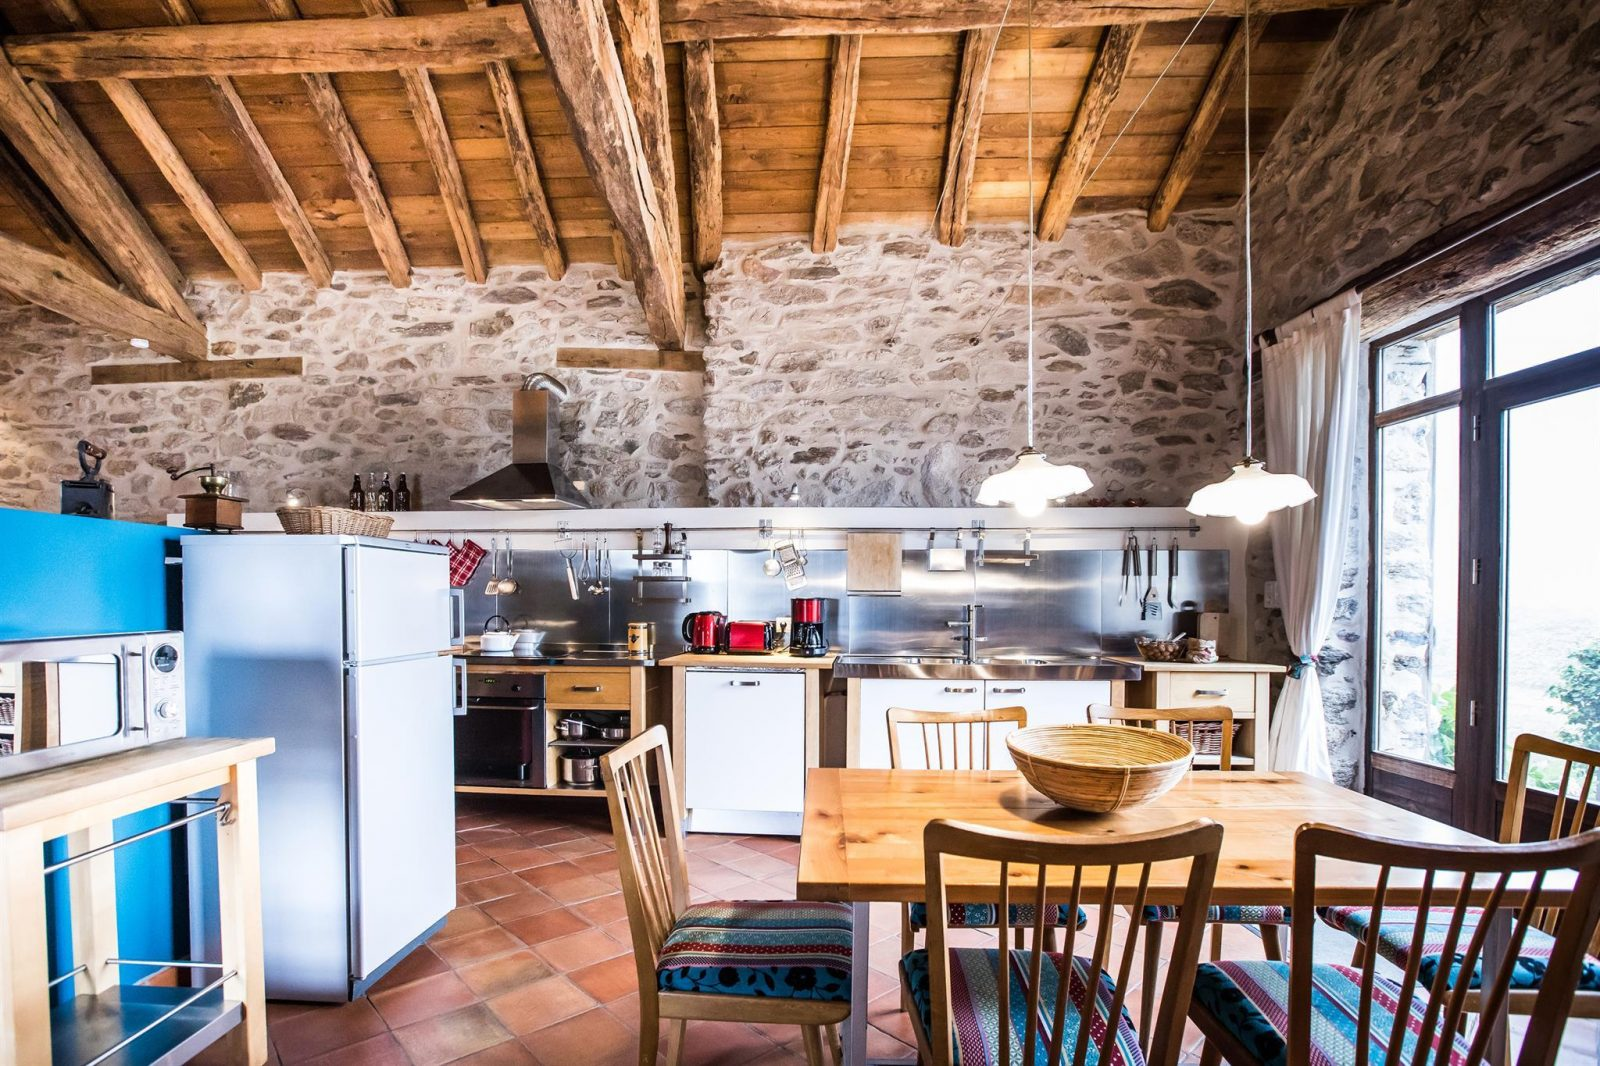 Caillé bas – Gîte à Fontrieu – Gîtes de France Tarn